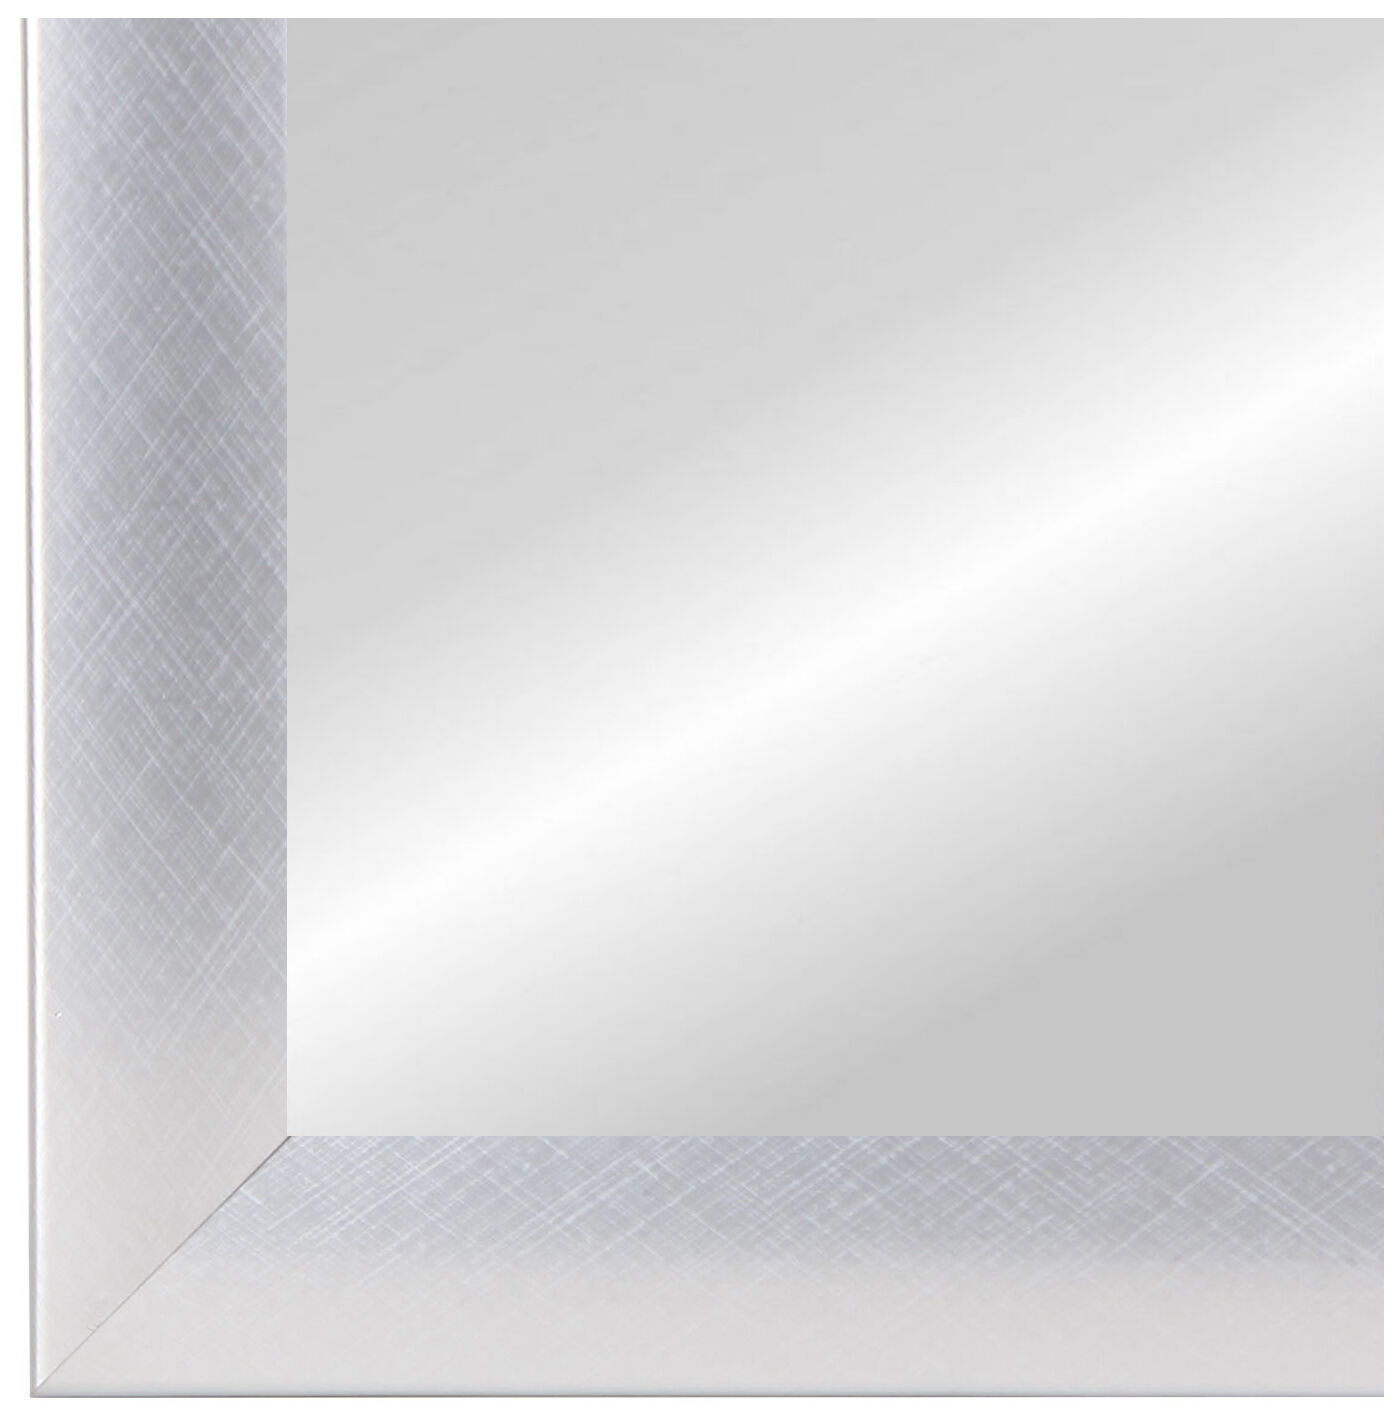 s l1600 - OLIMP Marco de Espejo - 80 X 70CM Espejo Pared Espejo Baño - Calidad Superior